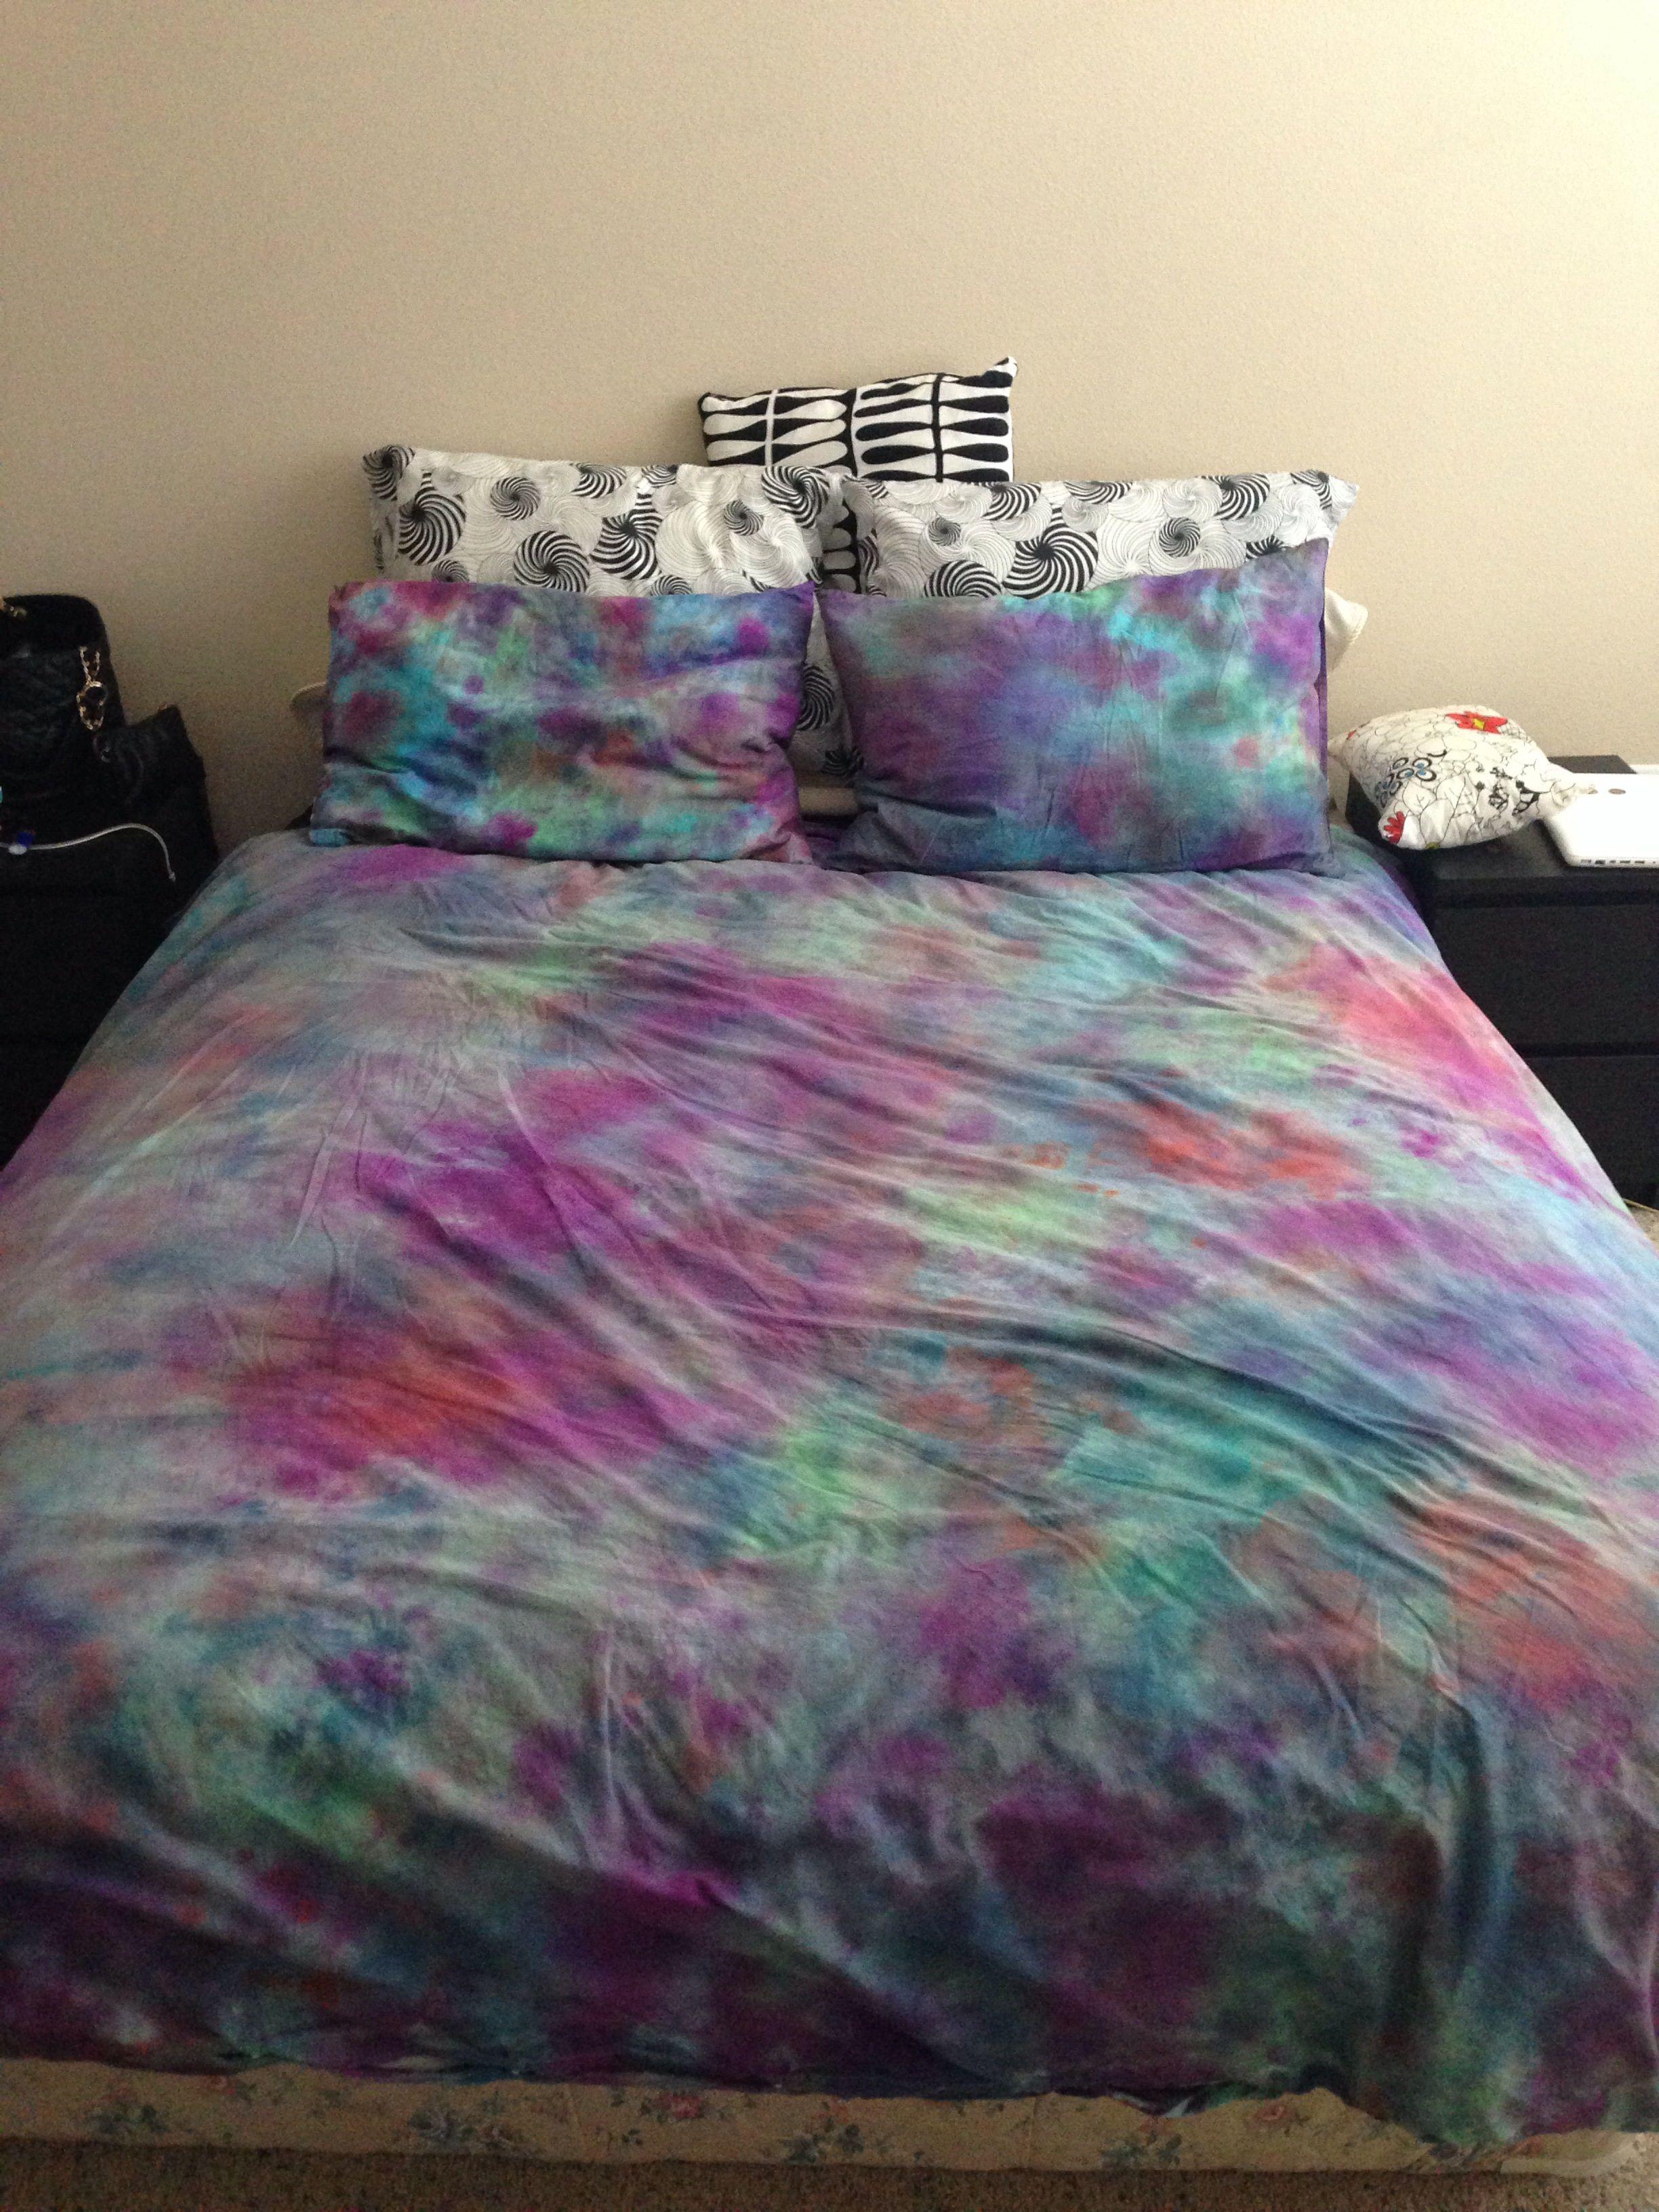 DIY tie dye bed sheets in 2019 Diy tie dye bedding, Tie